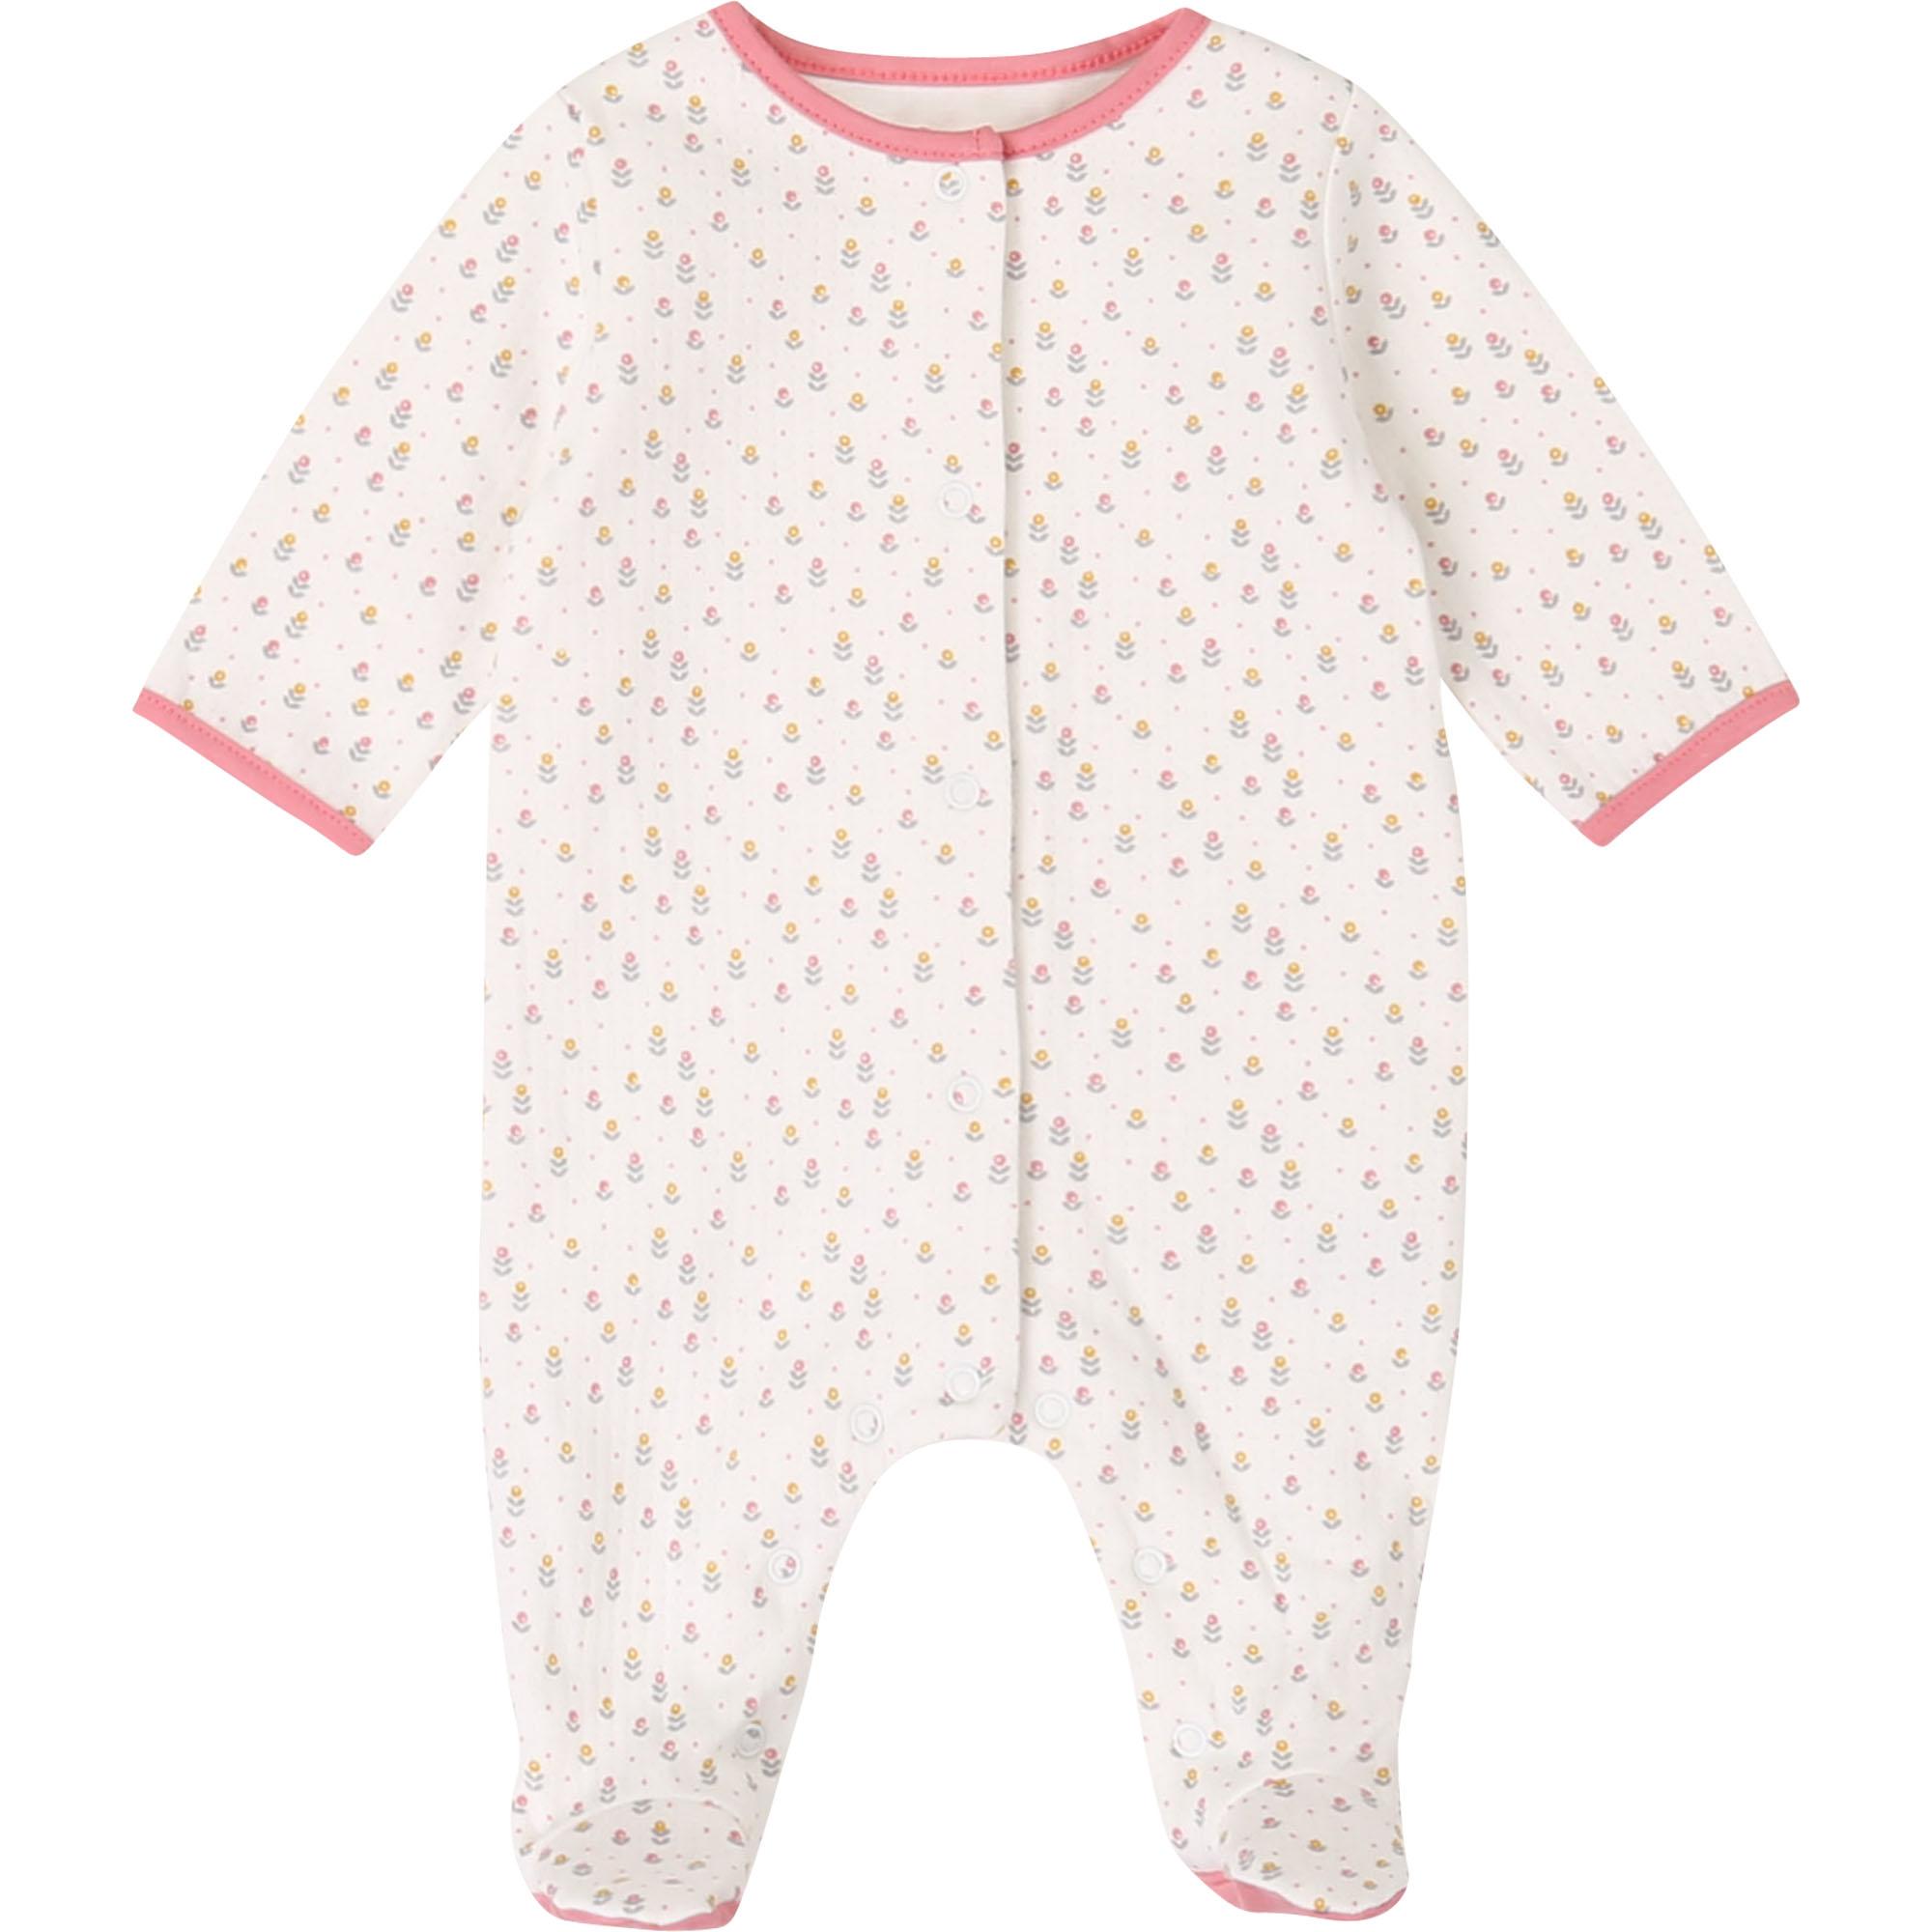 Pyjama coton bio majoritaire CARREMENT BEAU BEBE COUCHE FILLE Blanc